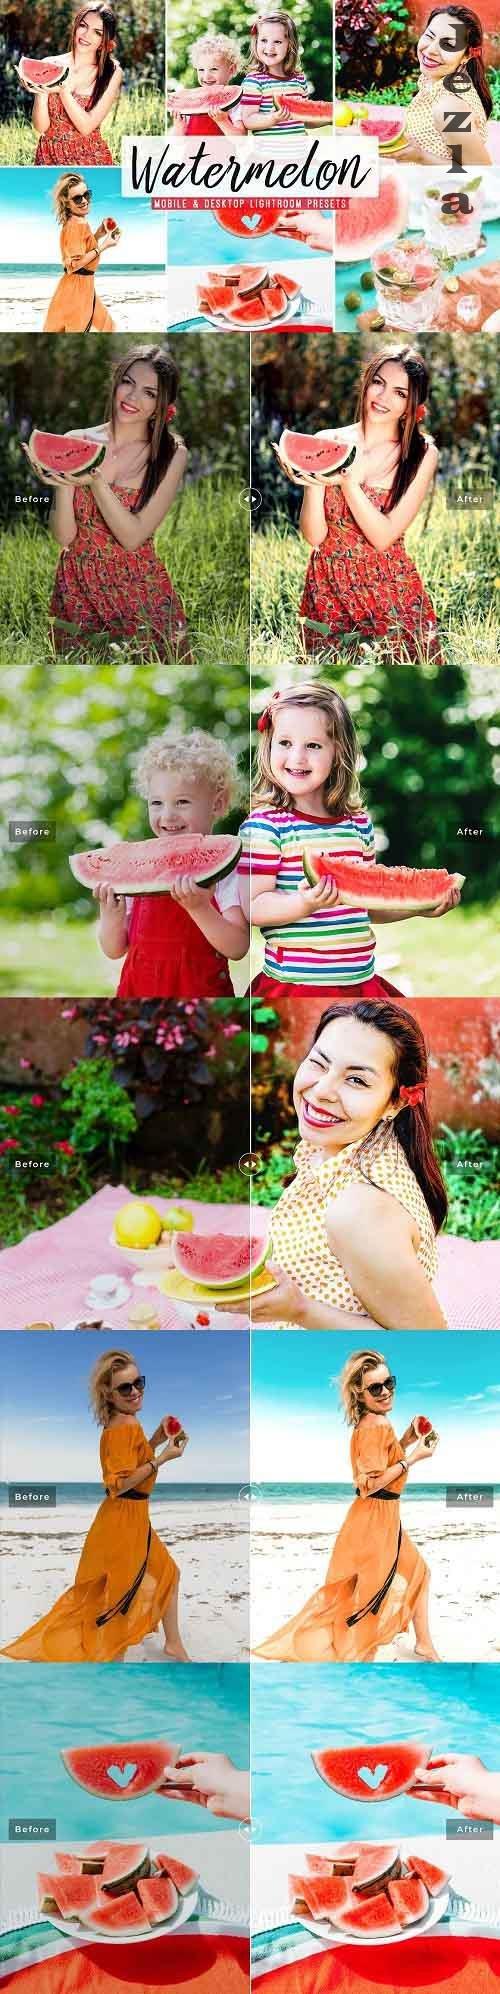 Watermelon Pro Lightroom Presets - 5426930 - Mobile & Desktop